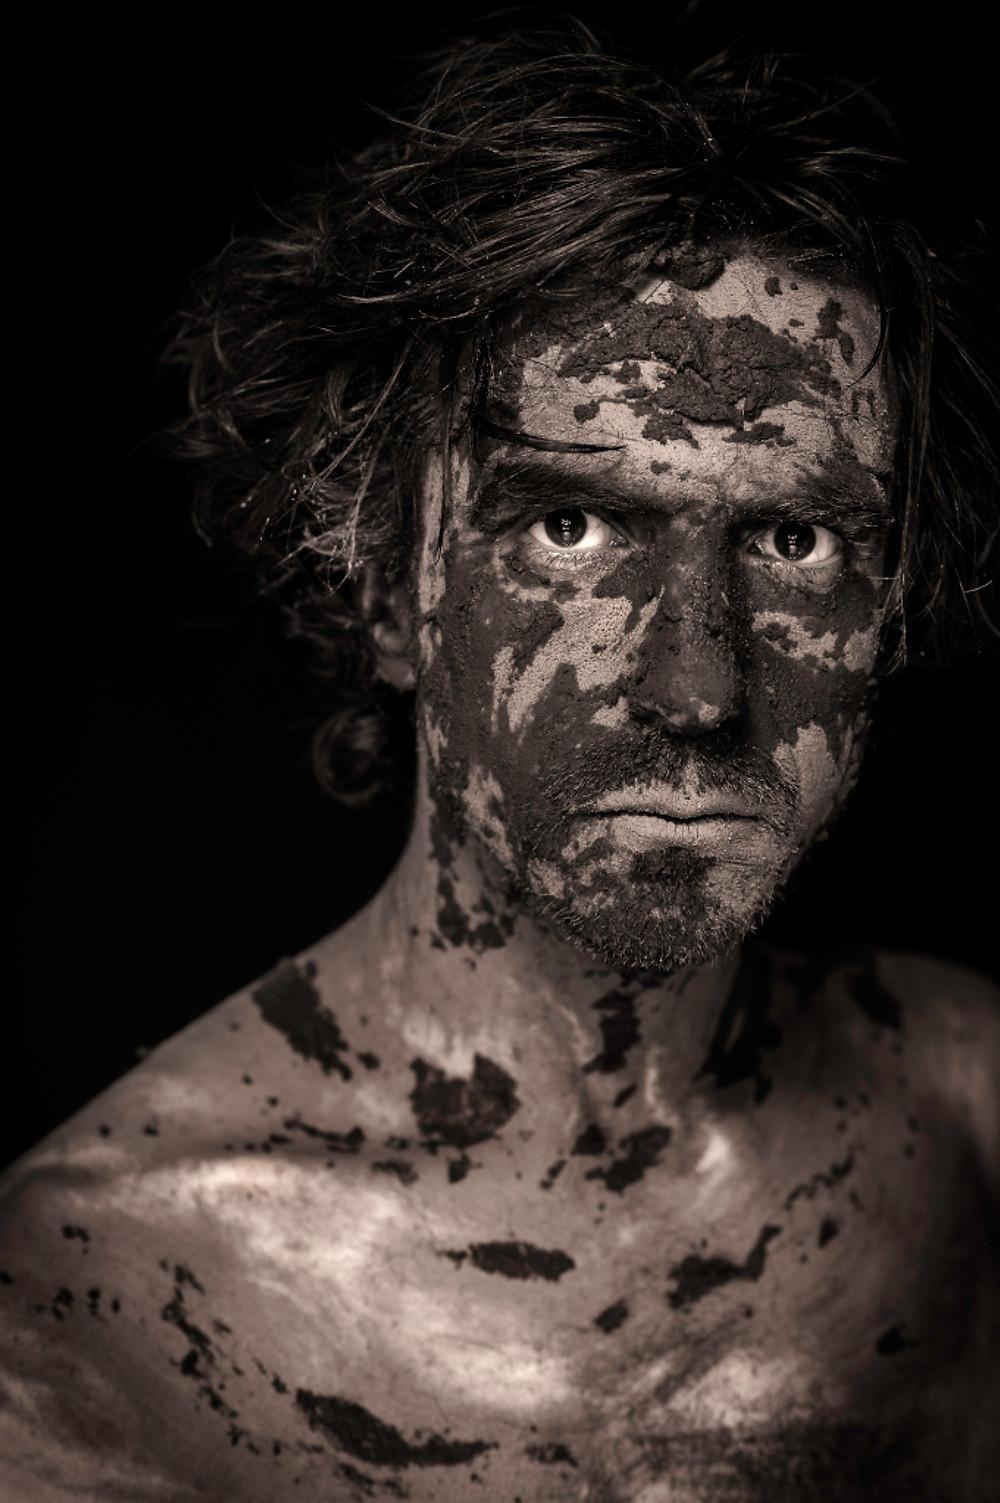 Muddy Face 1